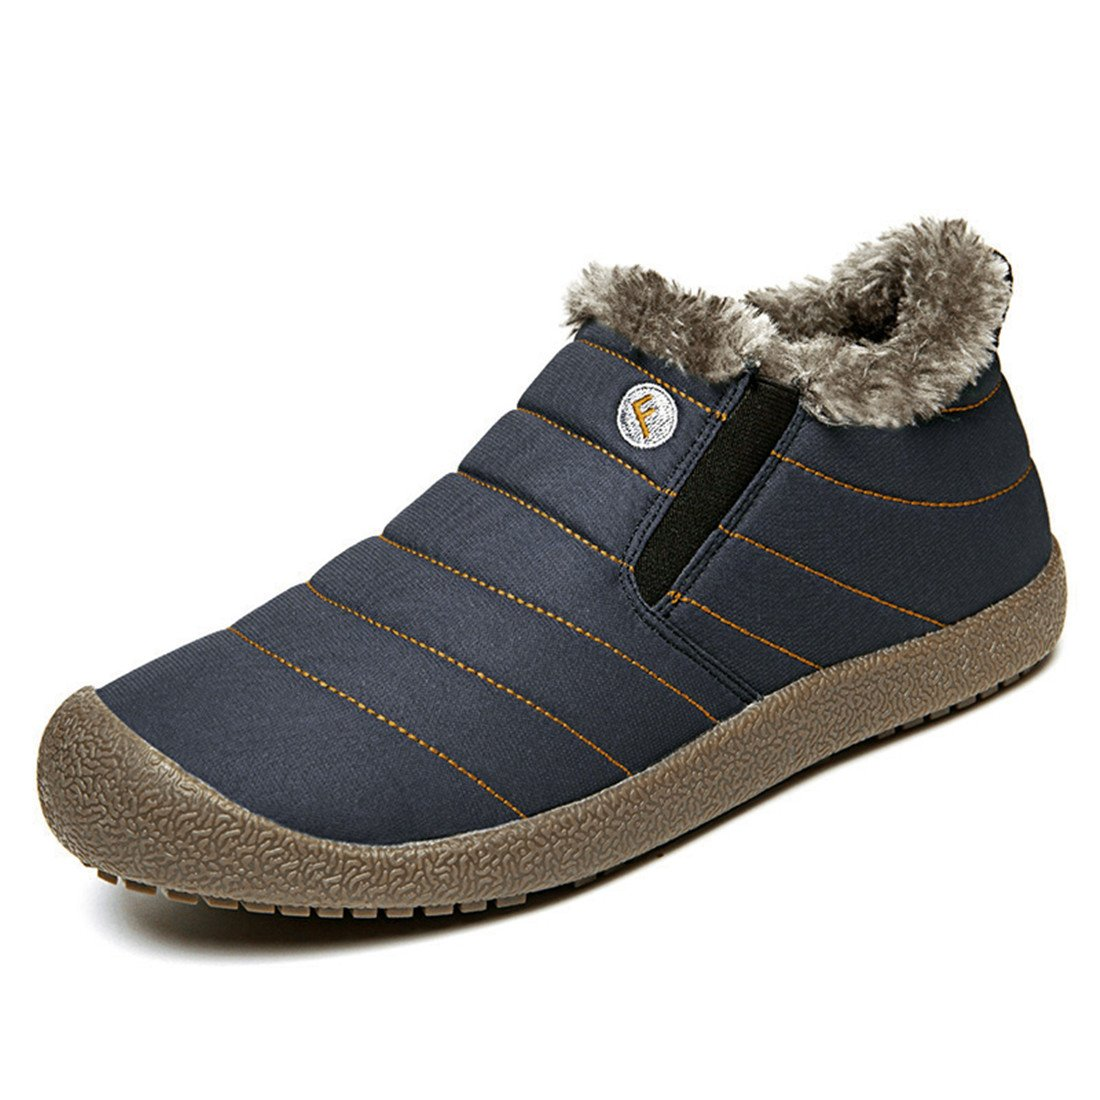 ChicWind Men Women Waterproof Snow Boots Fur Lined Winter Outdoor Slip On Shoes Navy Blue